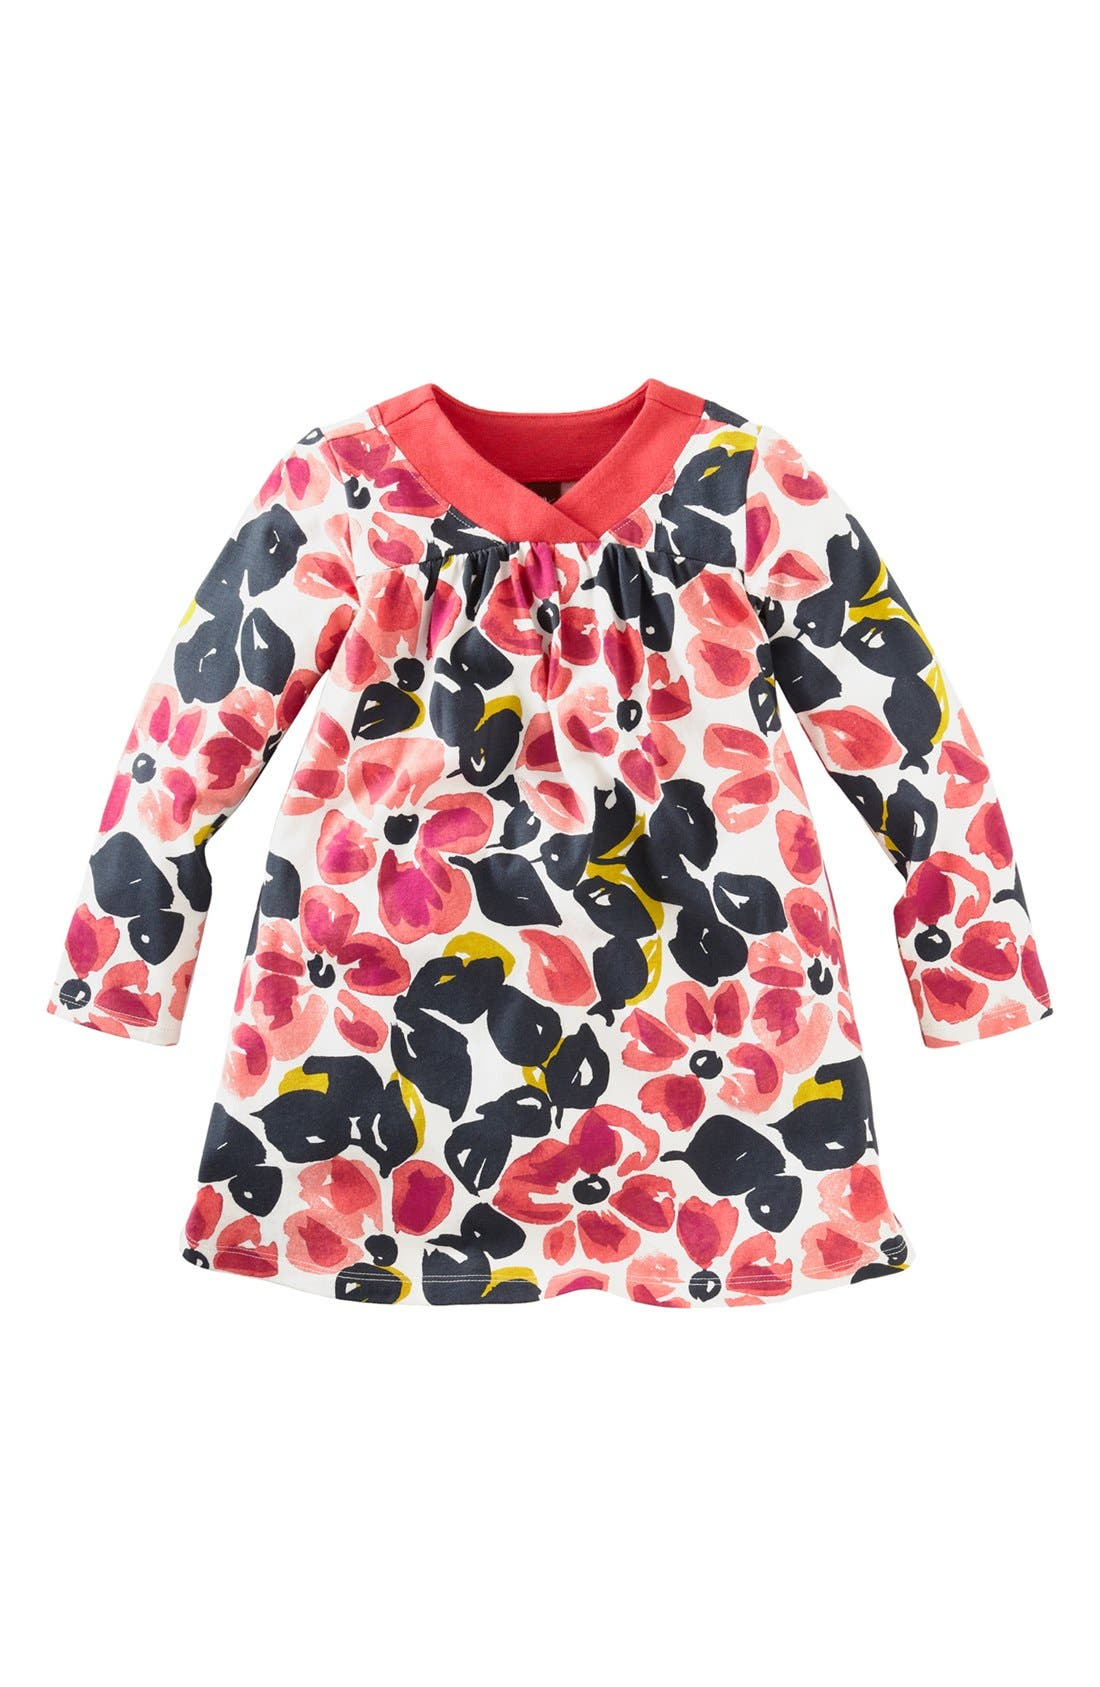 Alternate Image 1 Selected - Tea Collection 'Water Blossom' Dress (Little Girls & Big Girls)